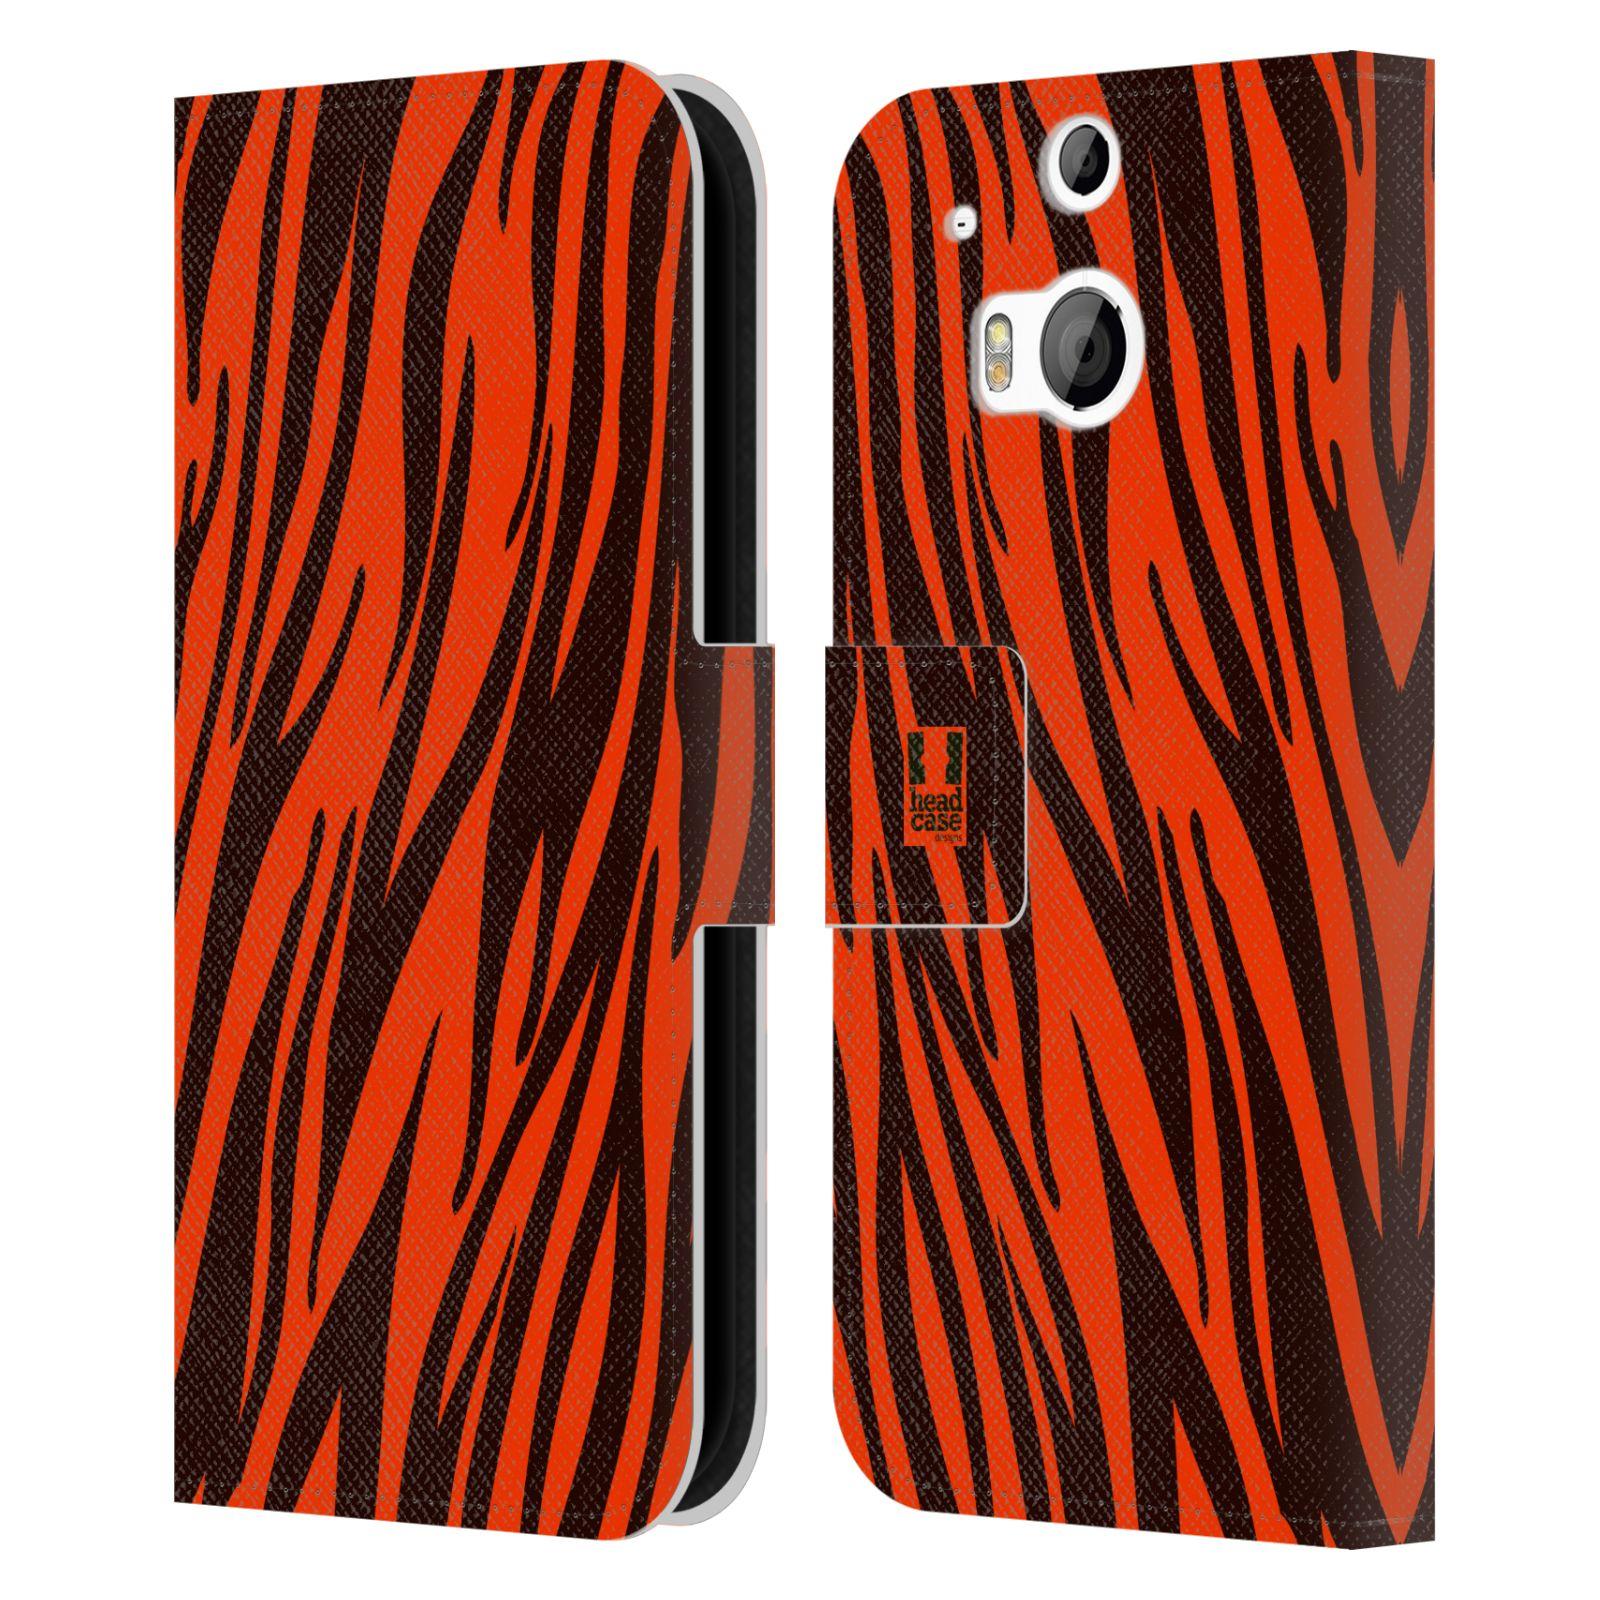 HEAD CASE Flipové pouzdro pro mobil HTC ONE (M8, M8s) Zvířecí barevné vzory oranžový tygr